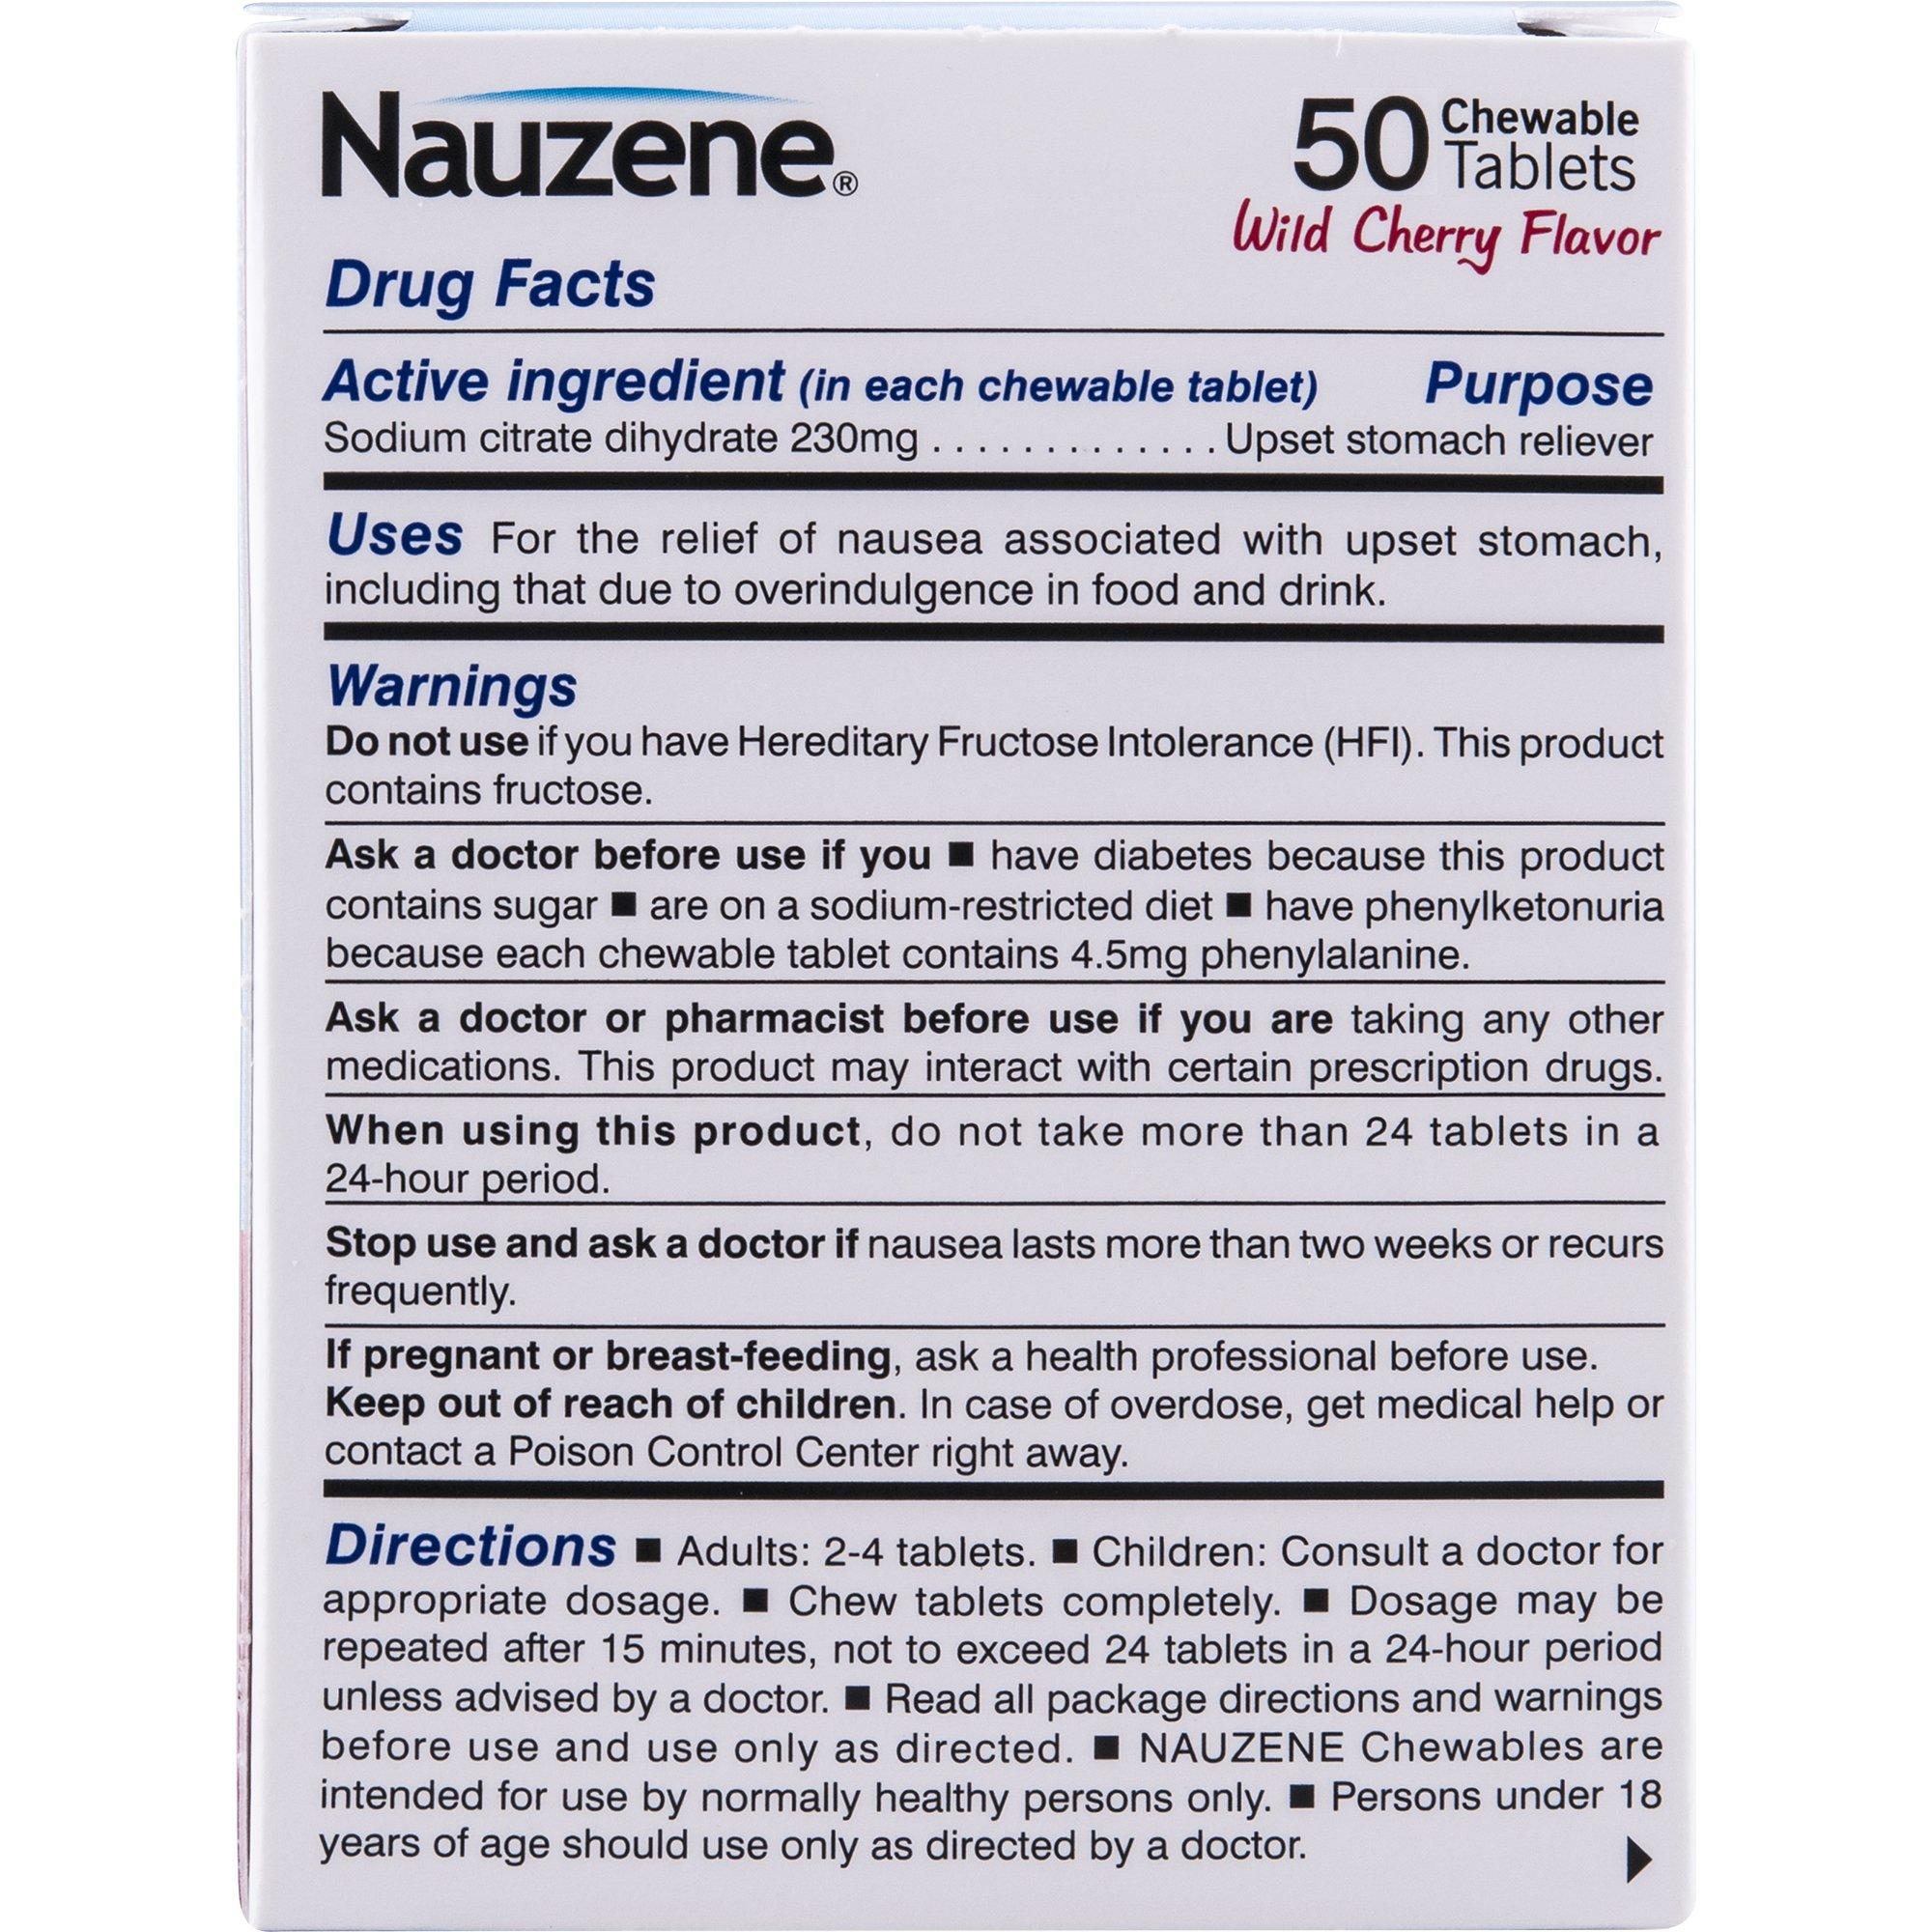 Nauzene For Nausea Chewable Tablets, Wild Cherry, 50 Count by Nauzene (Image #4)